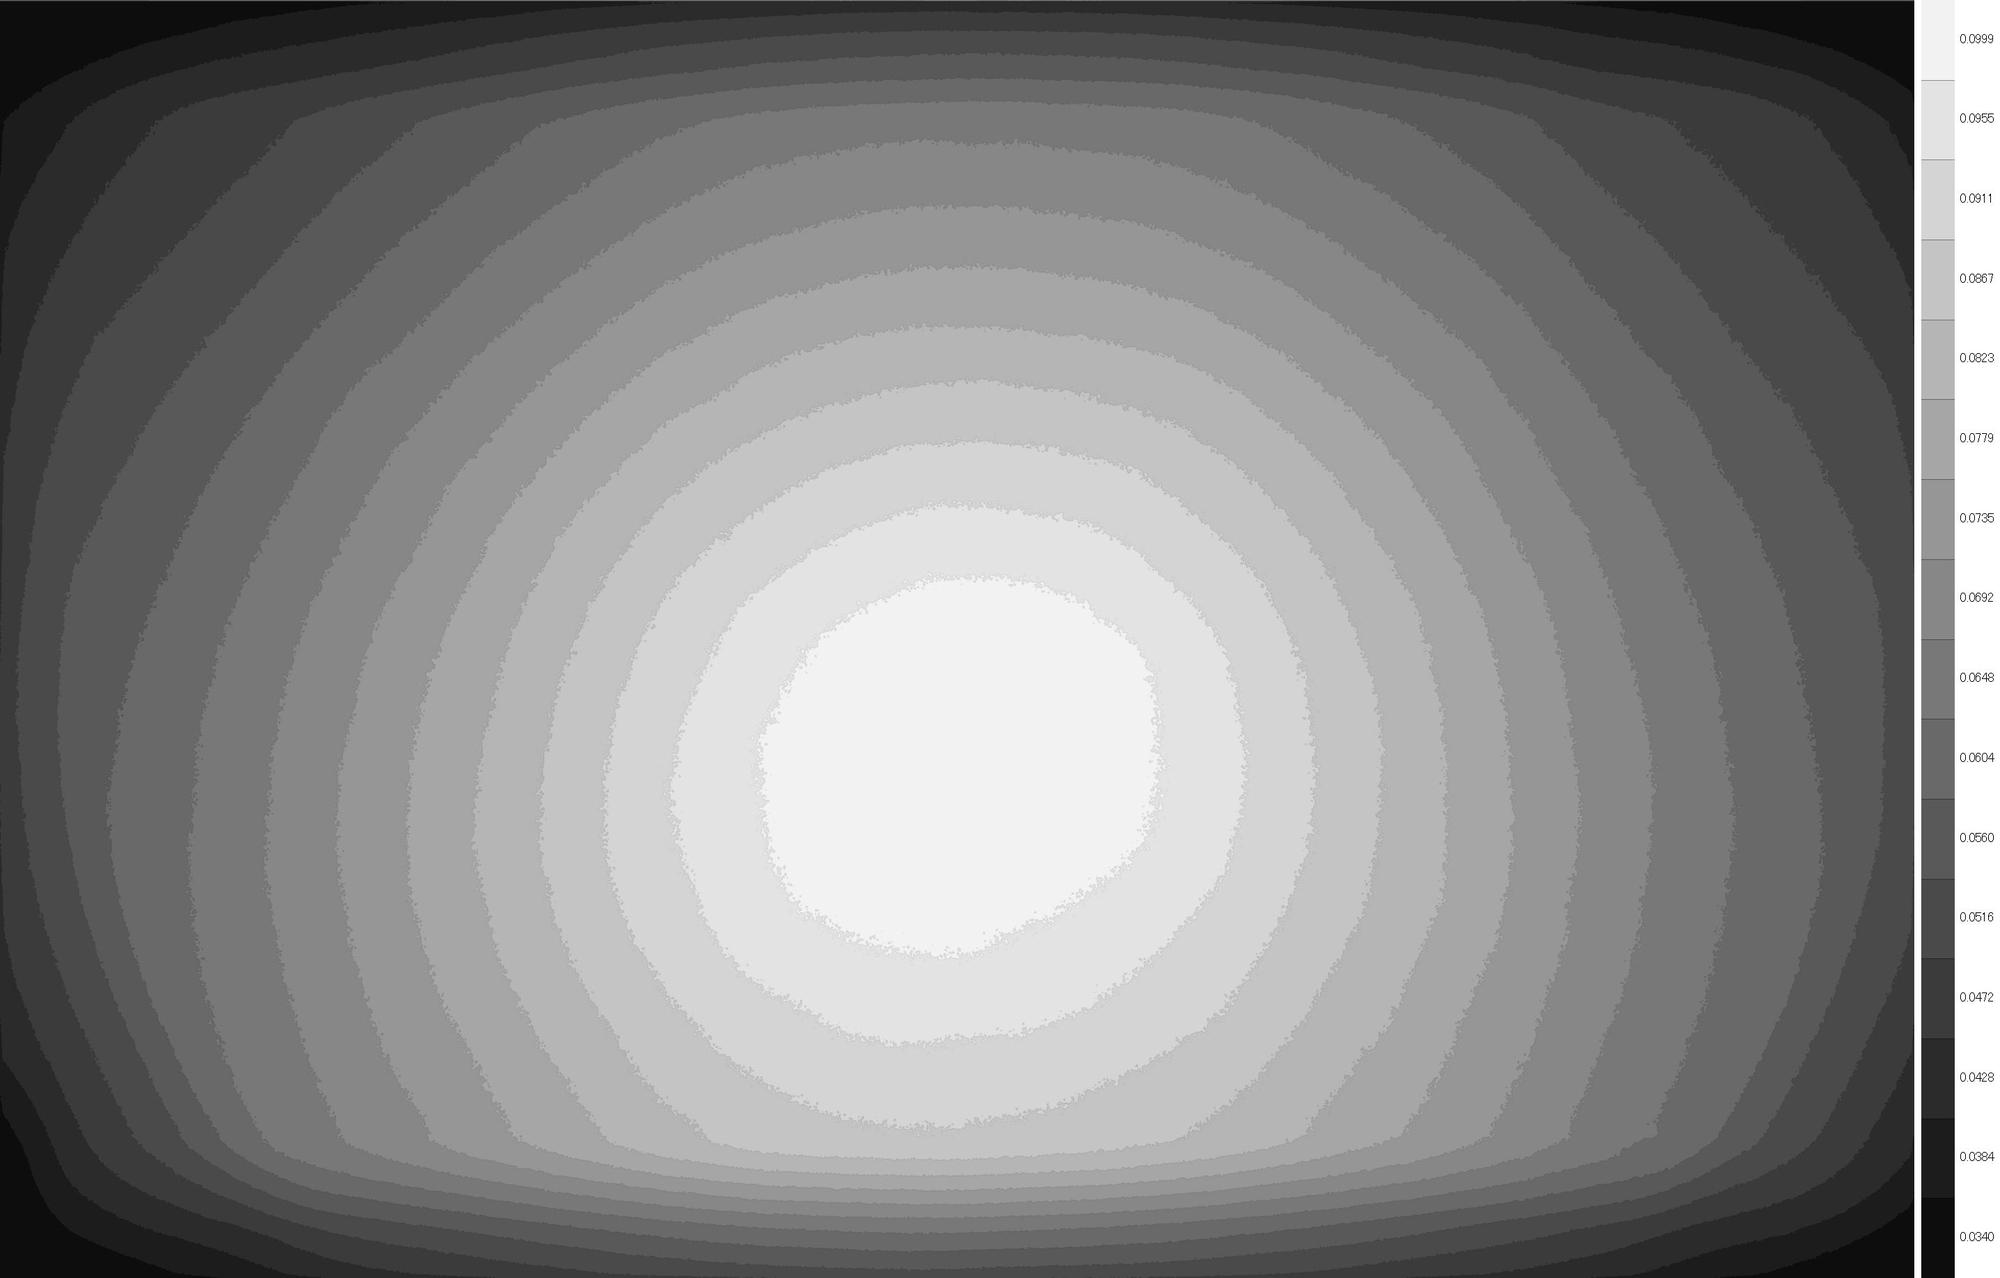 f:id:snct-astro:20210711220903j:plain